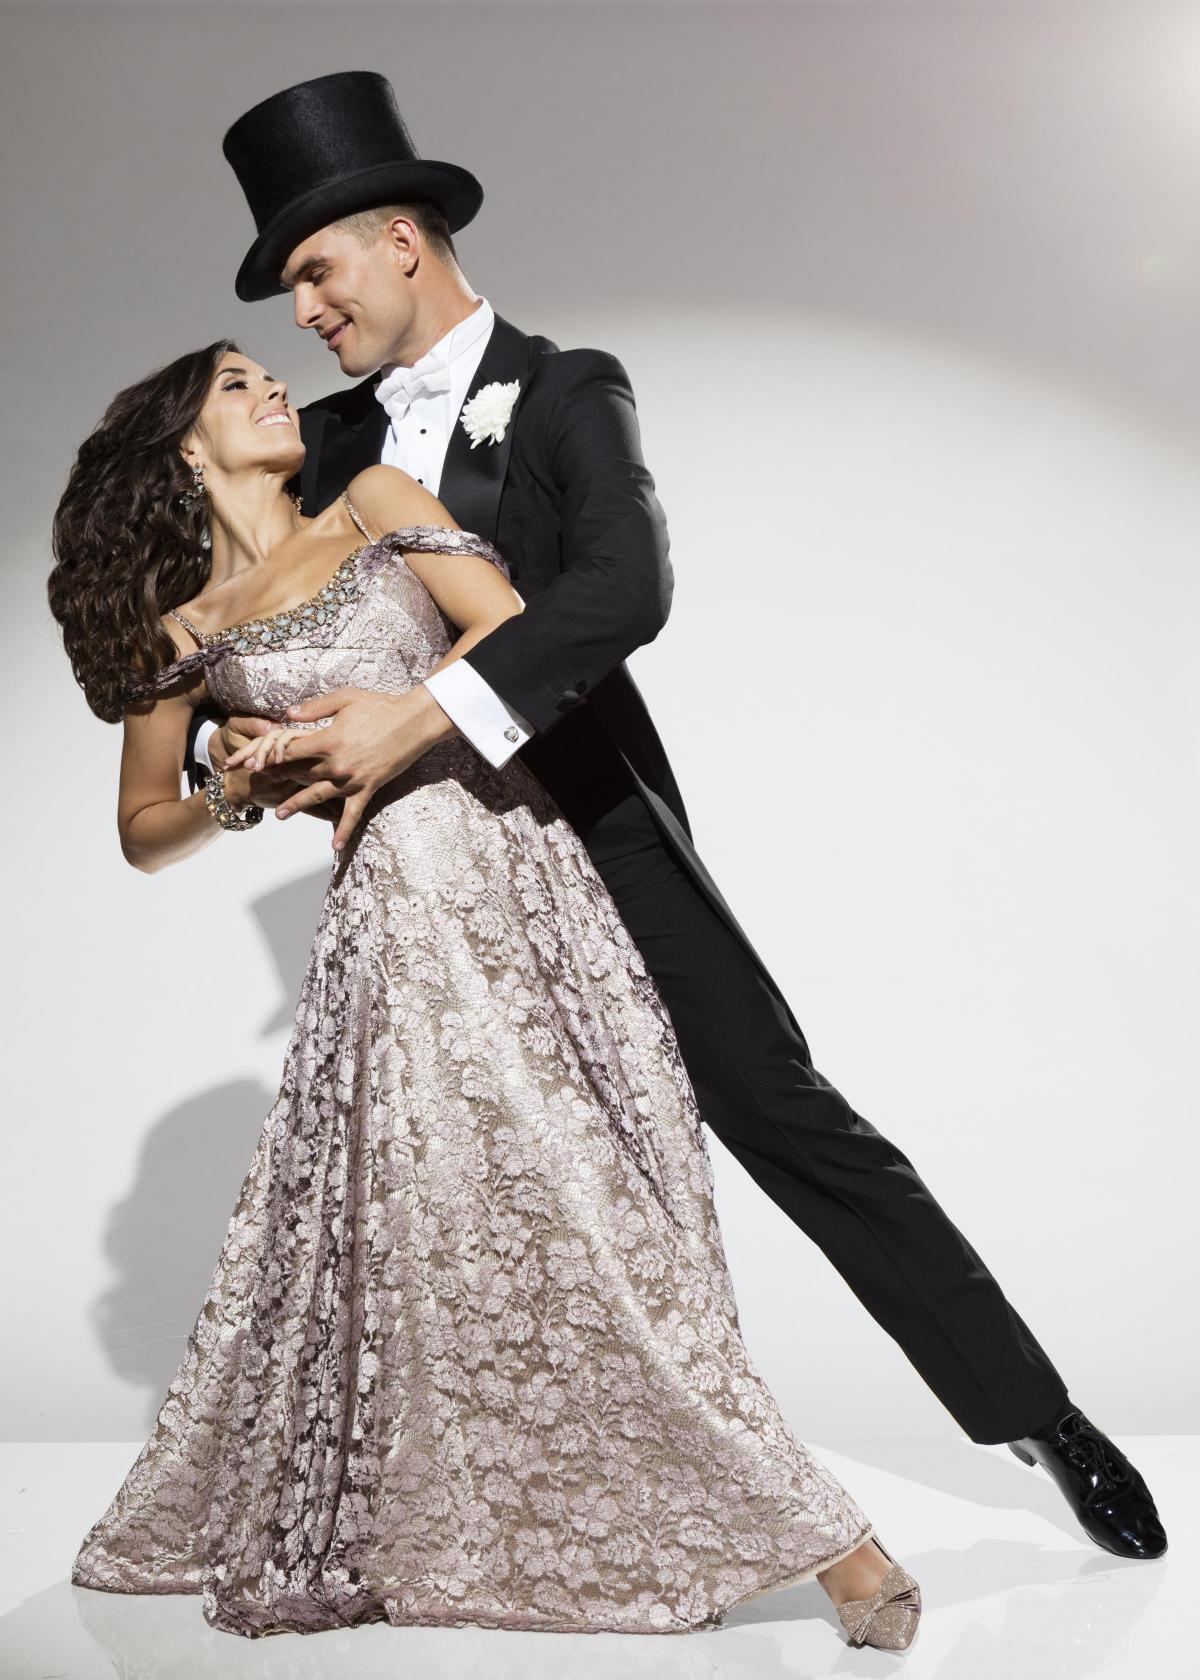 Strictly Come Dancing Stars Janette Manrara And Aljaz Skorjanec